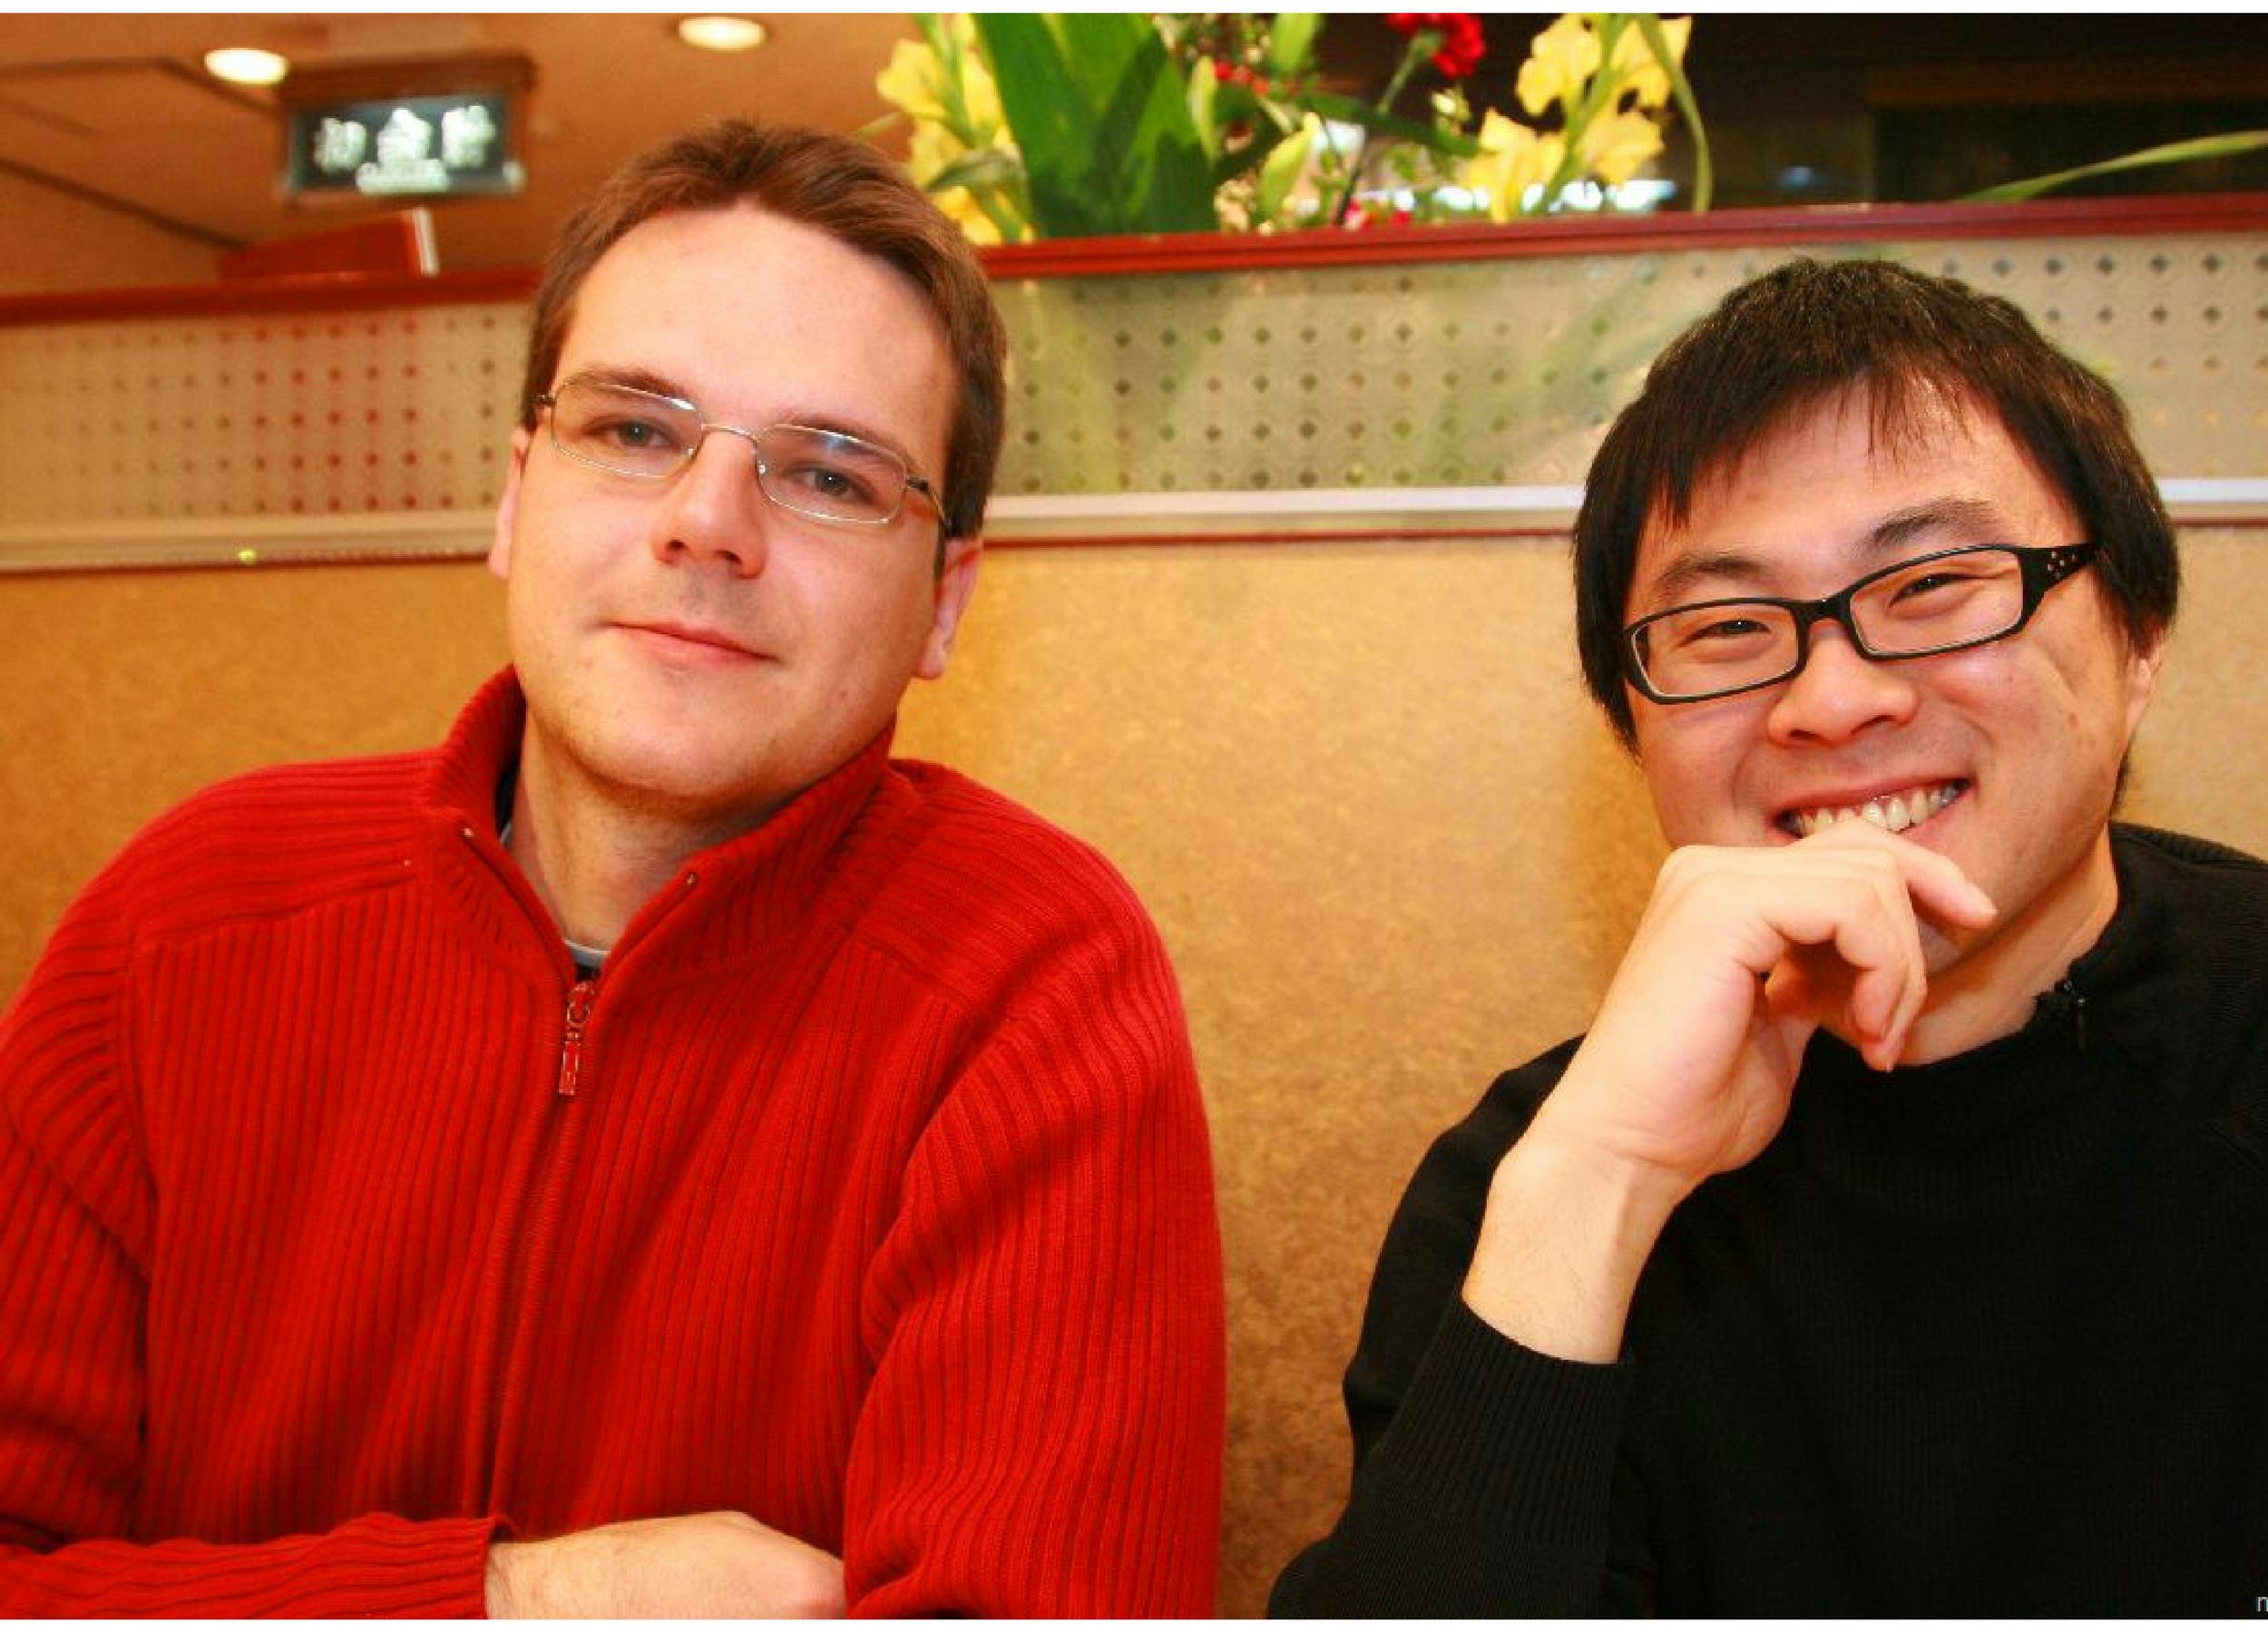 Episode #41:Ikigai Mindset with Hector Garcia - Ikigai Mindset with Hector Garcia, CERN Software Engineer and Internationally Best Selling Author